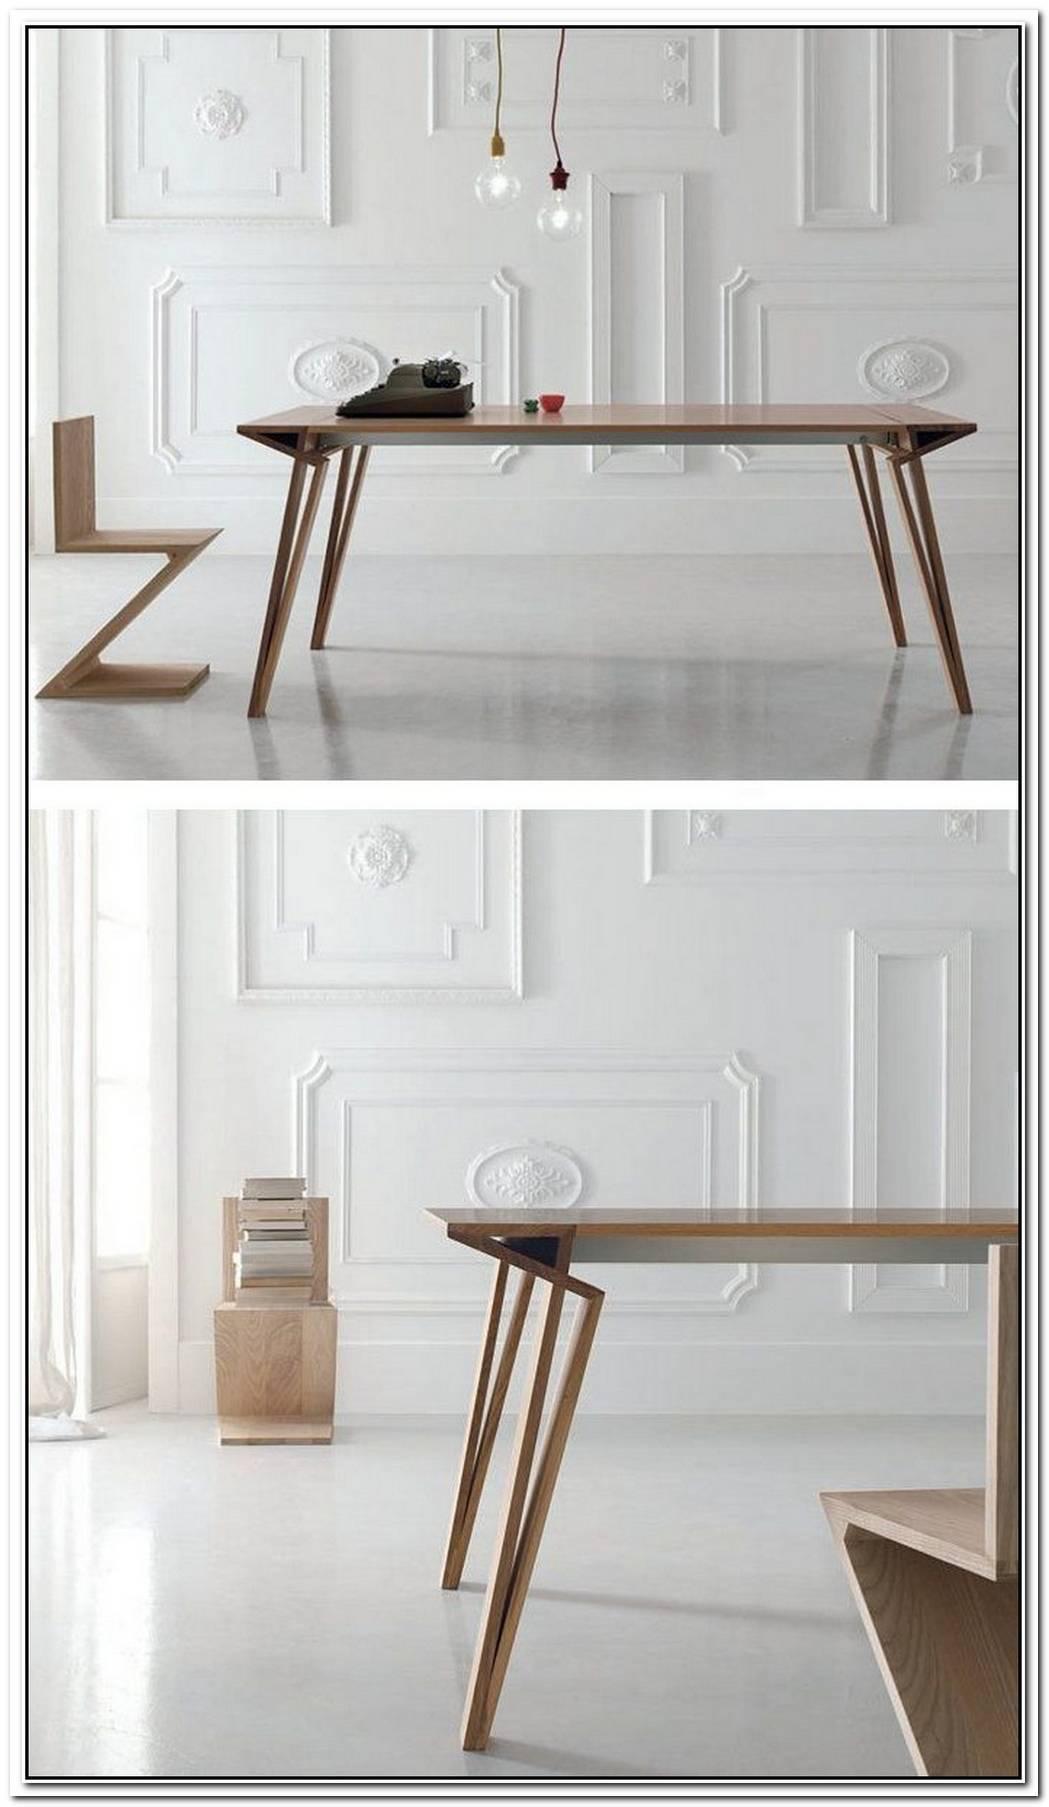 Philippe Barsol Designer Coffee Tables Combines Automotive With Interior Designs